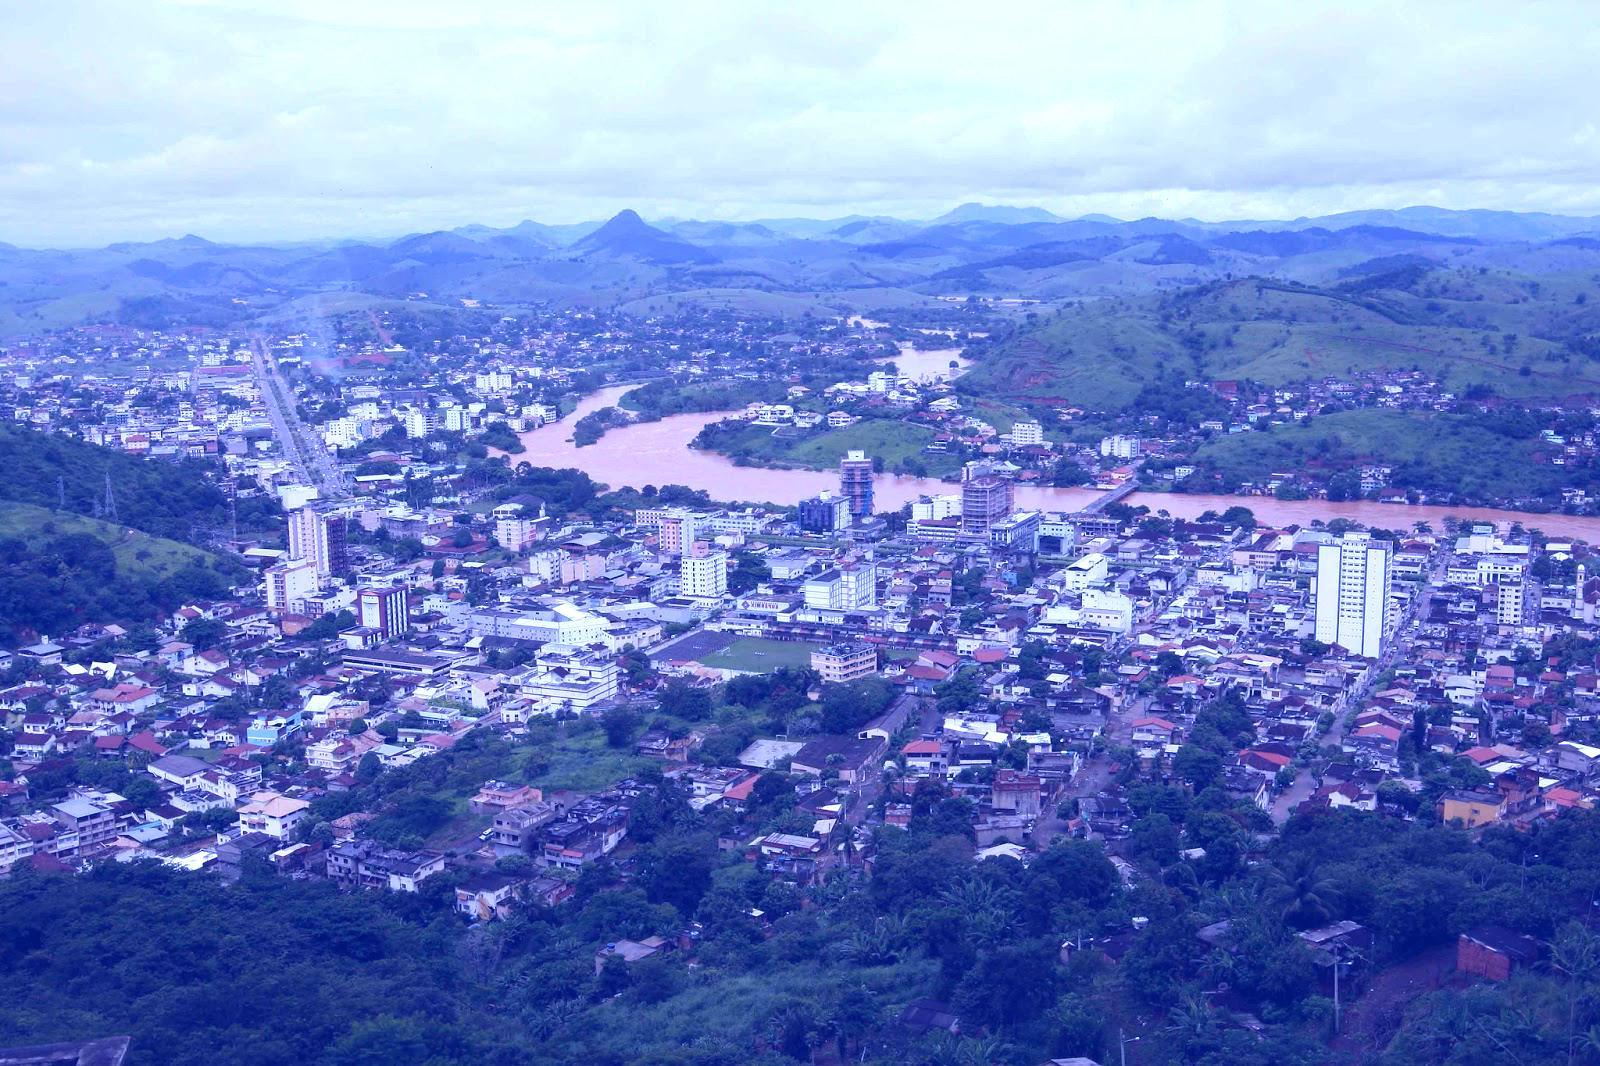 Mei Microempreendedor em Itaperuna, RJ